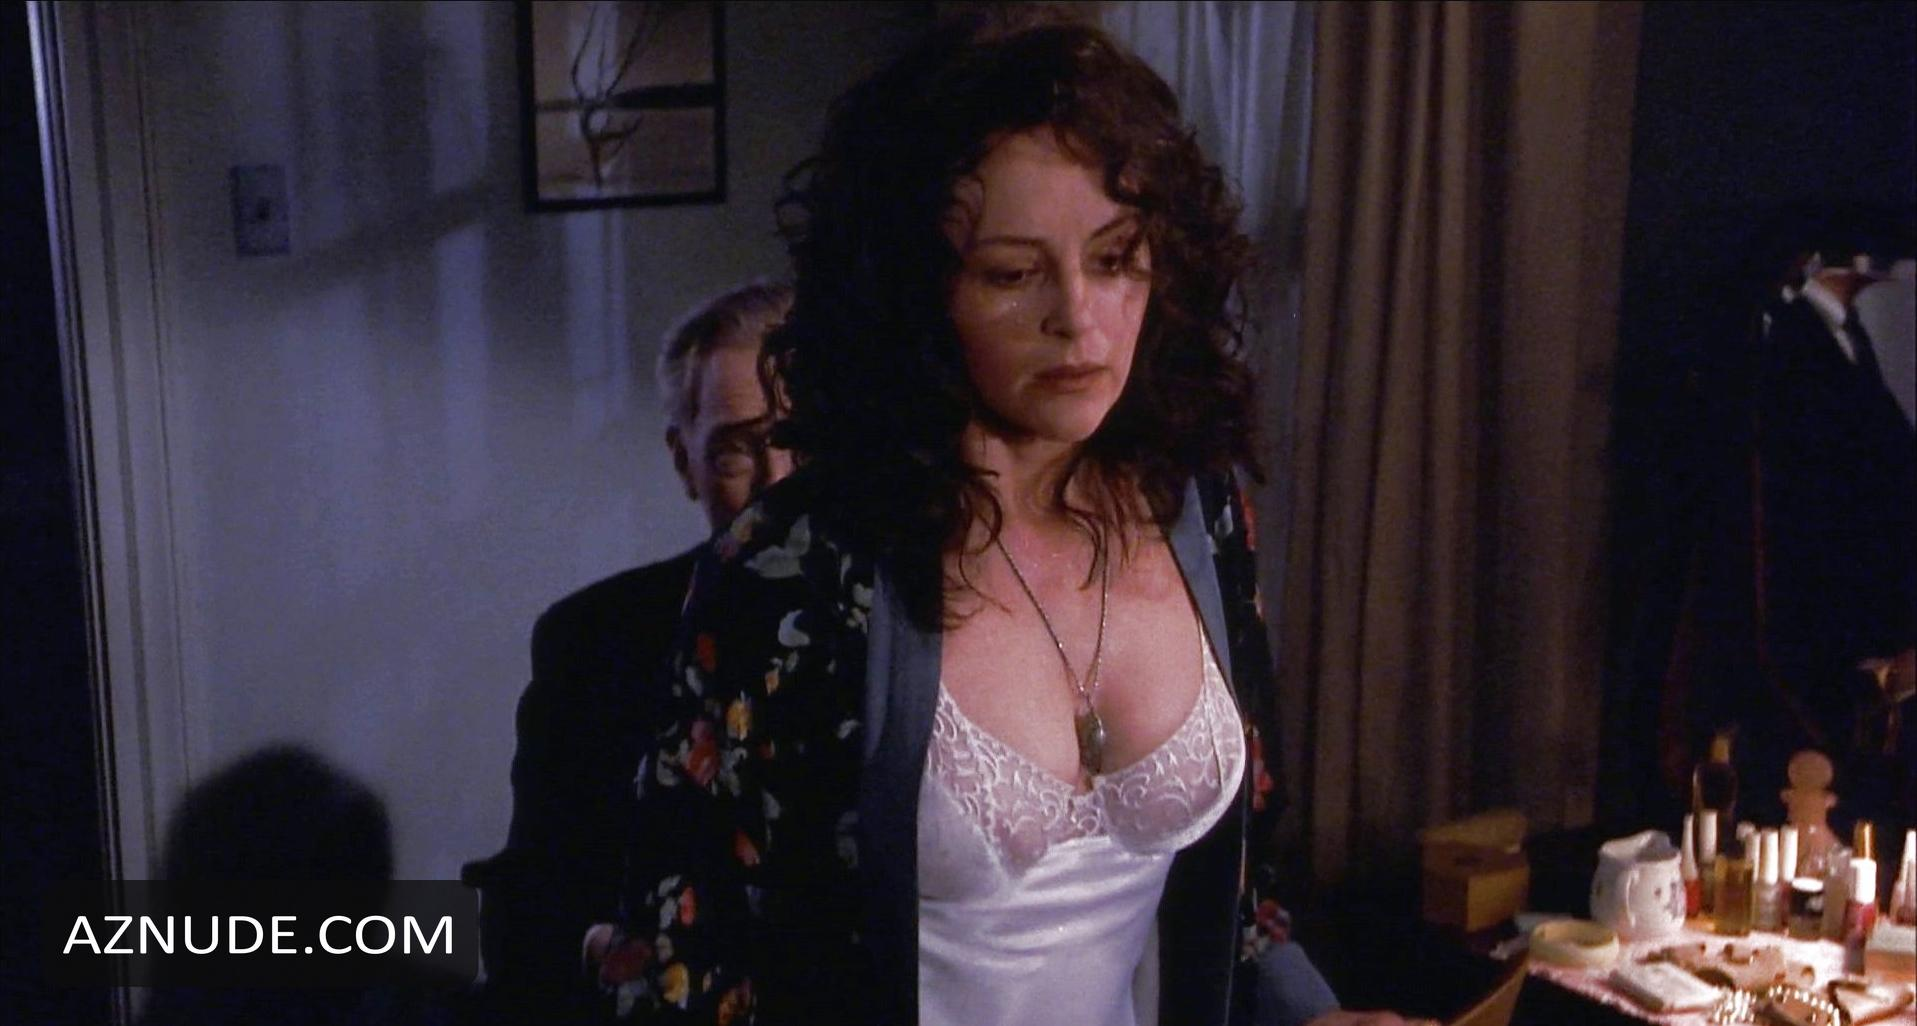 N bonnie naked hot bedelia